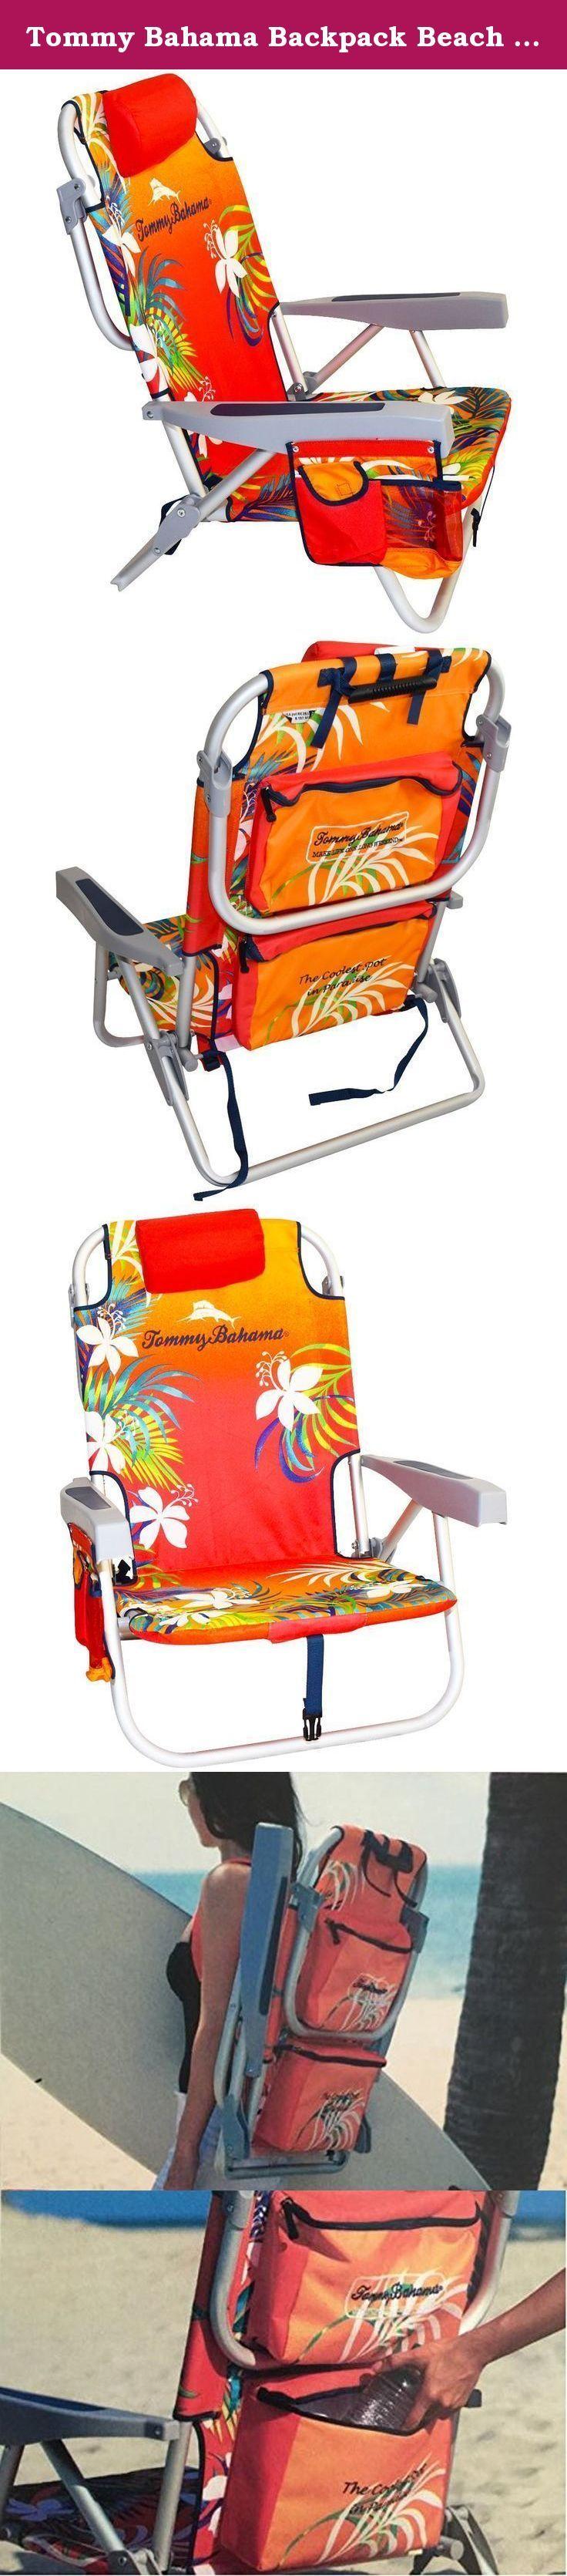 Tommy Bahama Backpack Beach Chair, Red. Beach chair, Tommy Bahama beach chair,red,chair,recliner,Tommy Bahama,beach,beach umbrella, Silla de playa,5 positions, backpack beach chair,backpack,cooler,Rio beach chair, large capacity, outdoor chair,2016,summer chair, beach recliner.